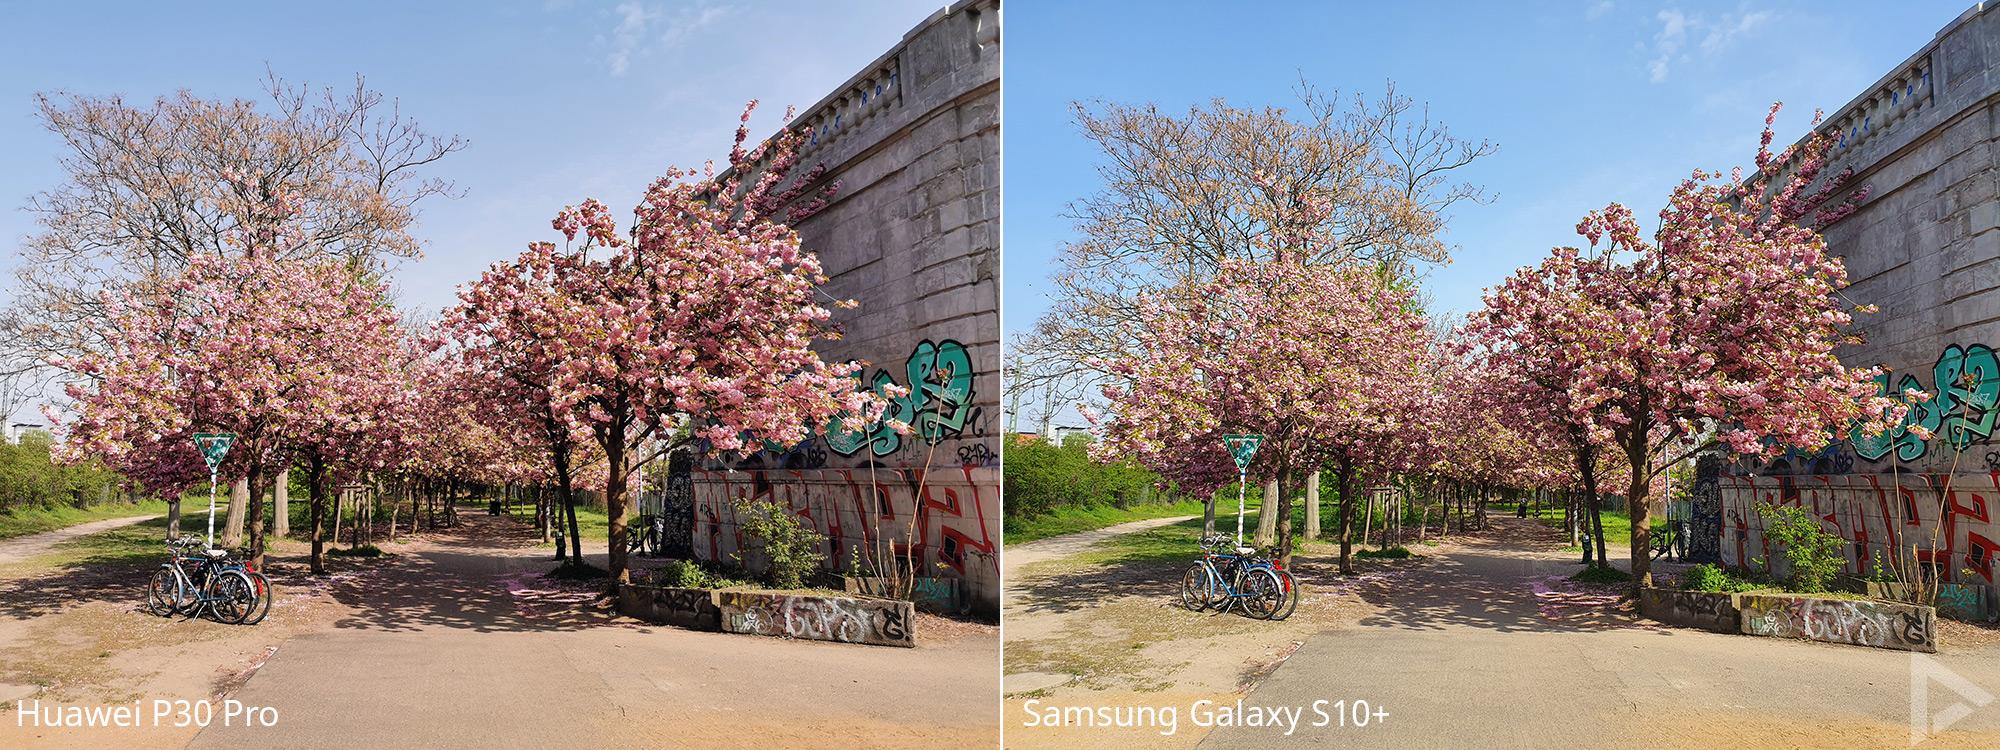 camera vergelijking Huawei P30 Pro - Samsung Galaxy S10 4